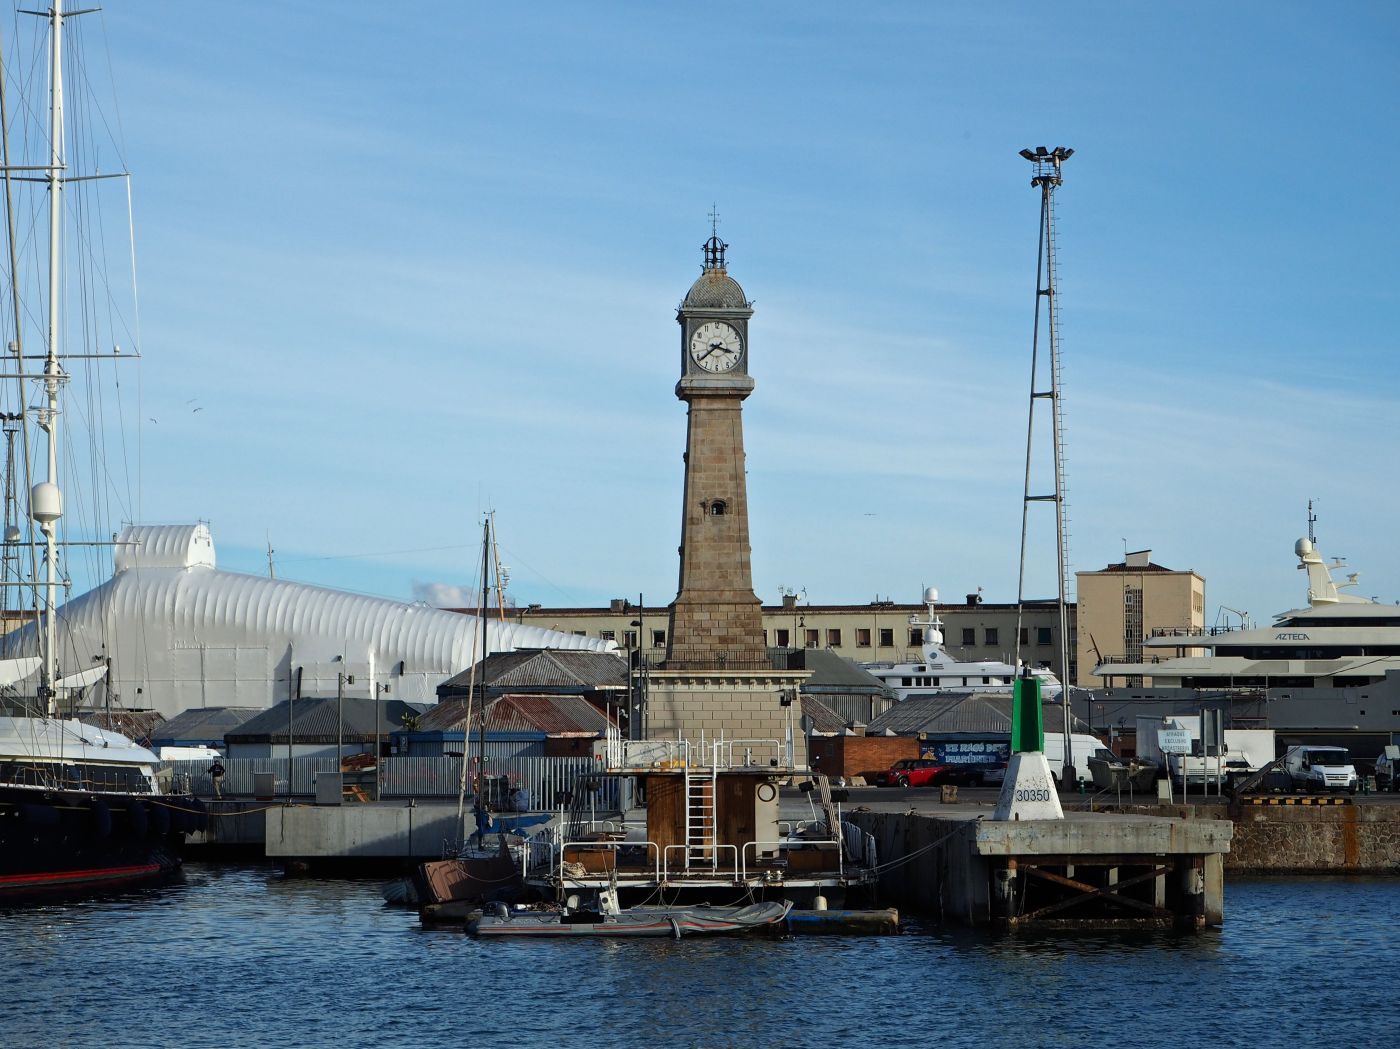 barceloneta clock tower